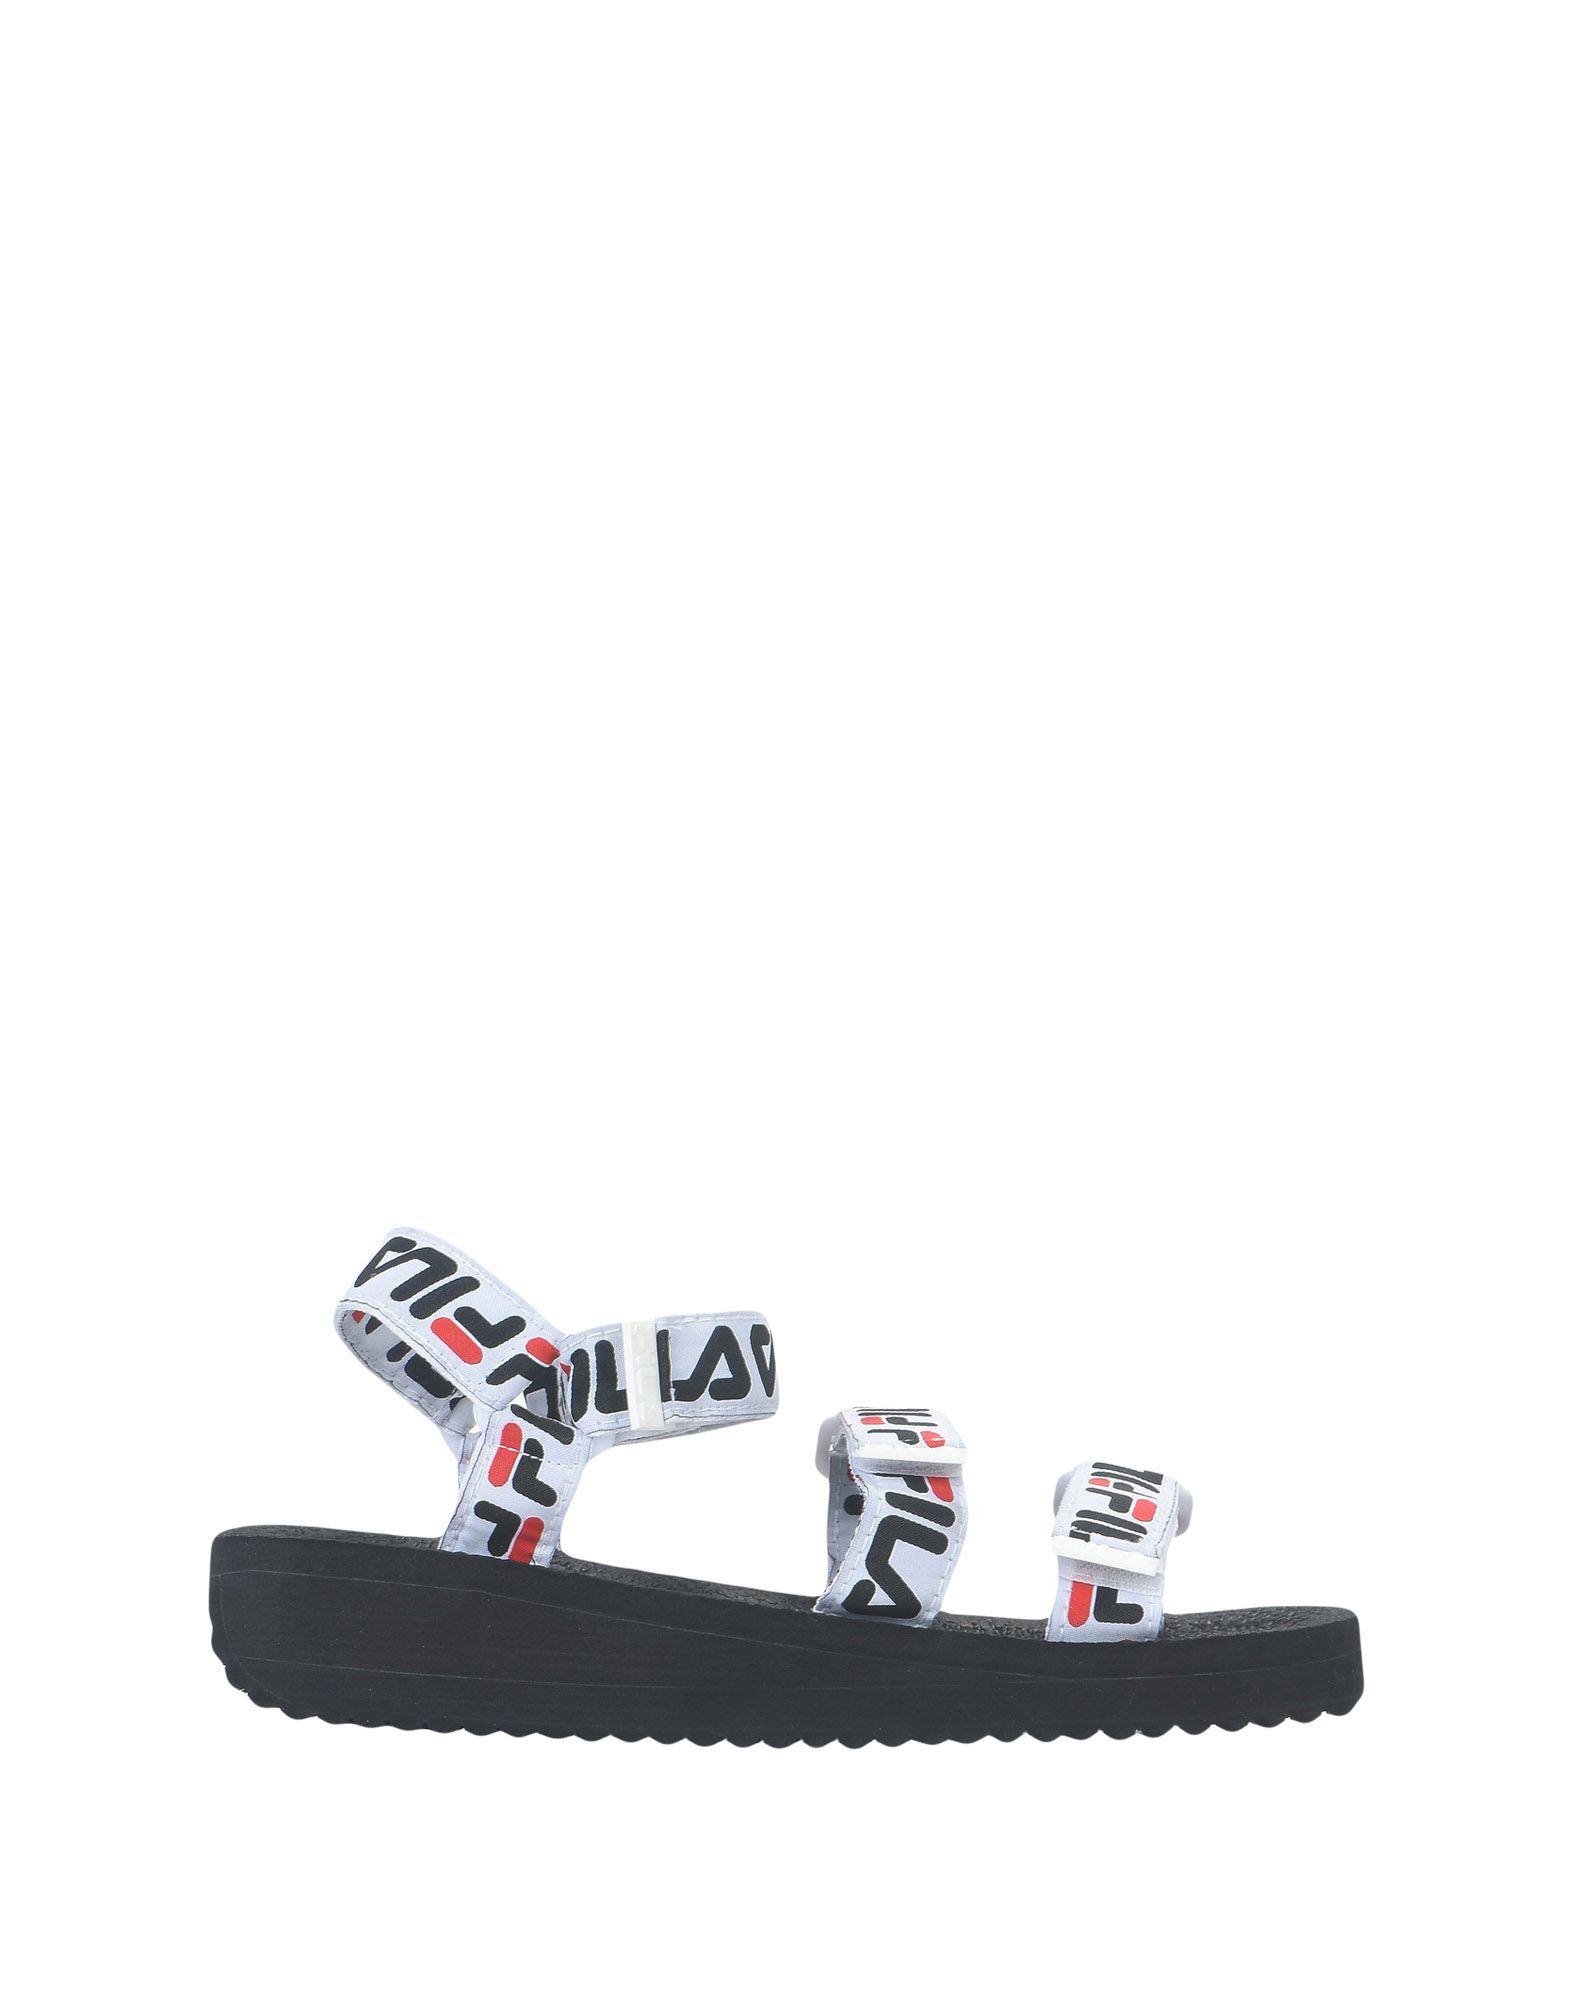 Fila Heritage Tomaia Logo Sandal Wmn beliebte  11492749RC Gute Qualität beliebte Wmn Schuhe 3848ad